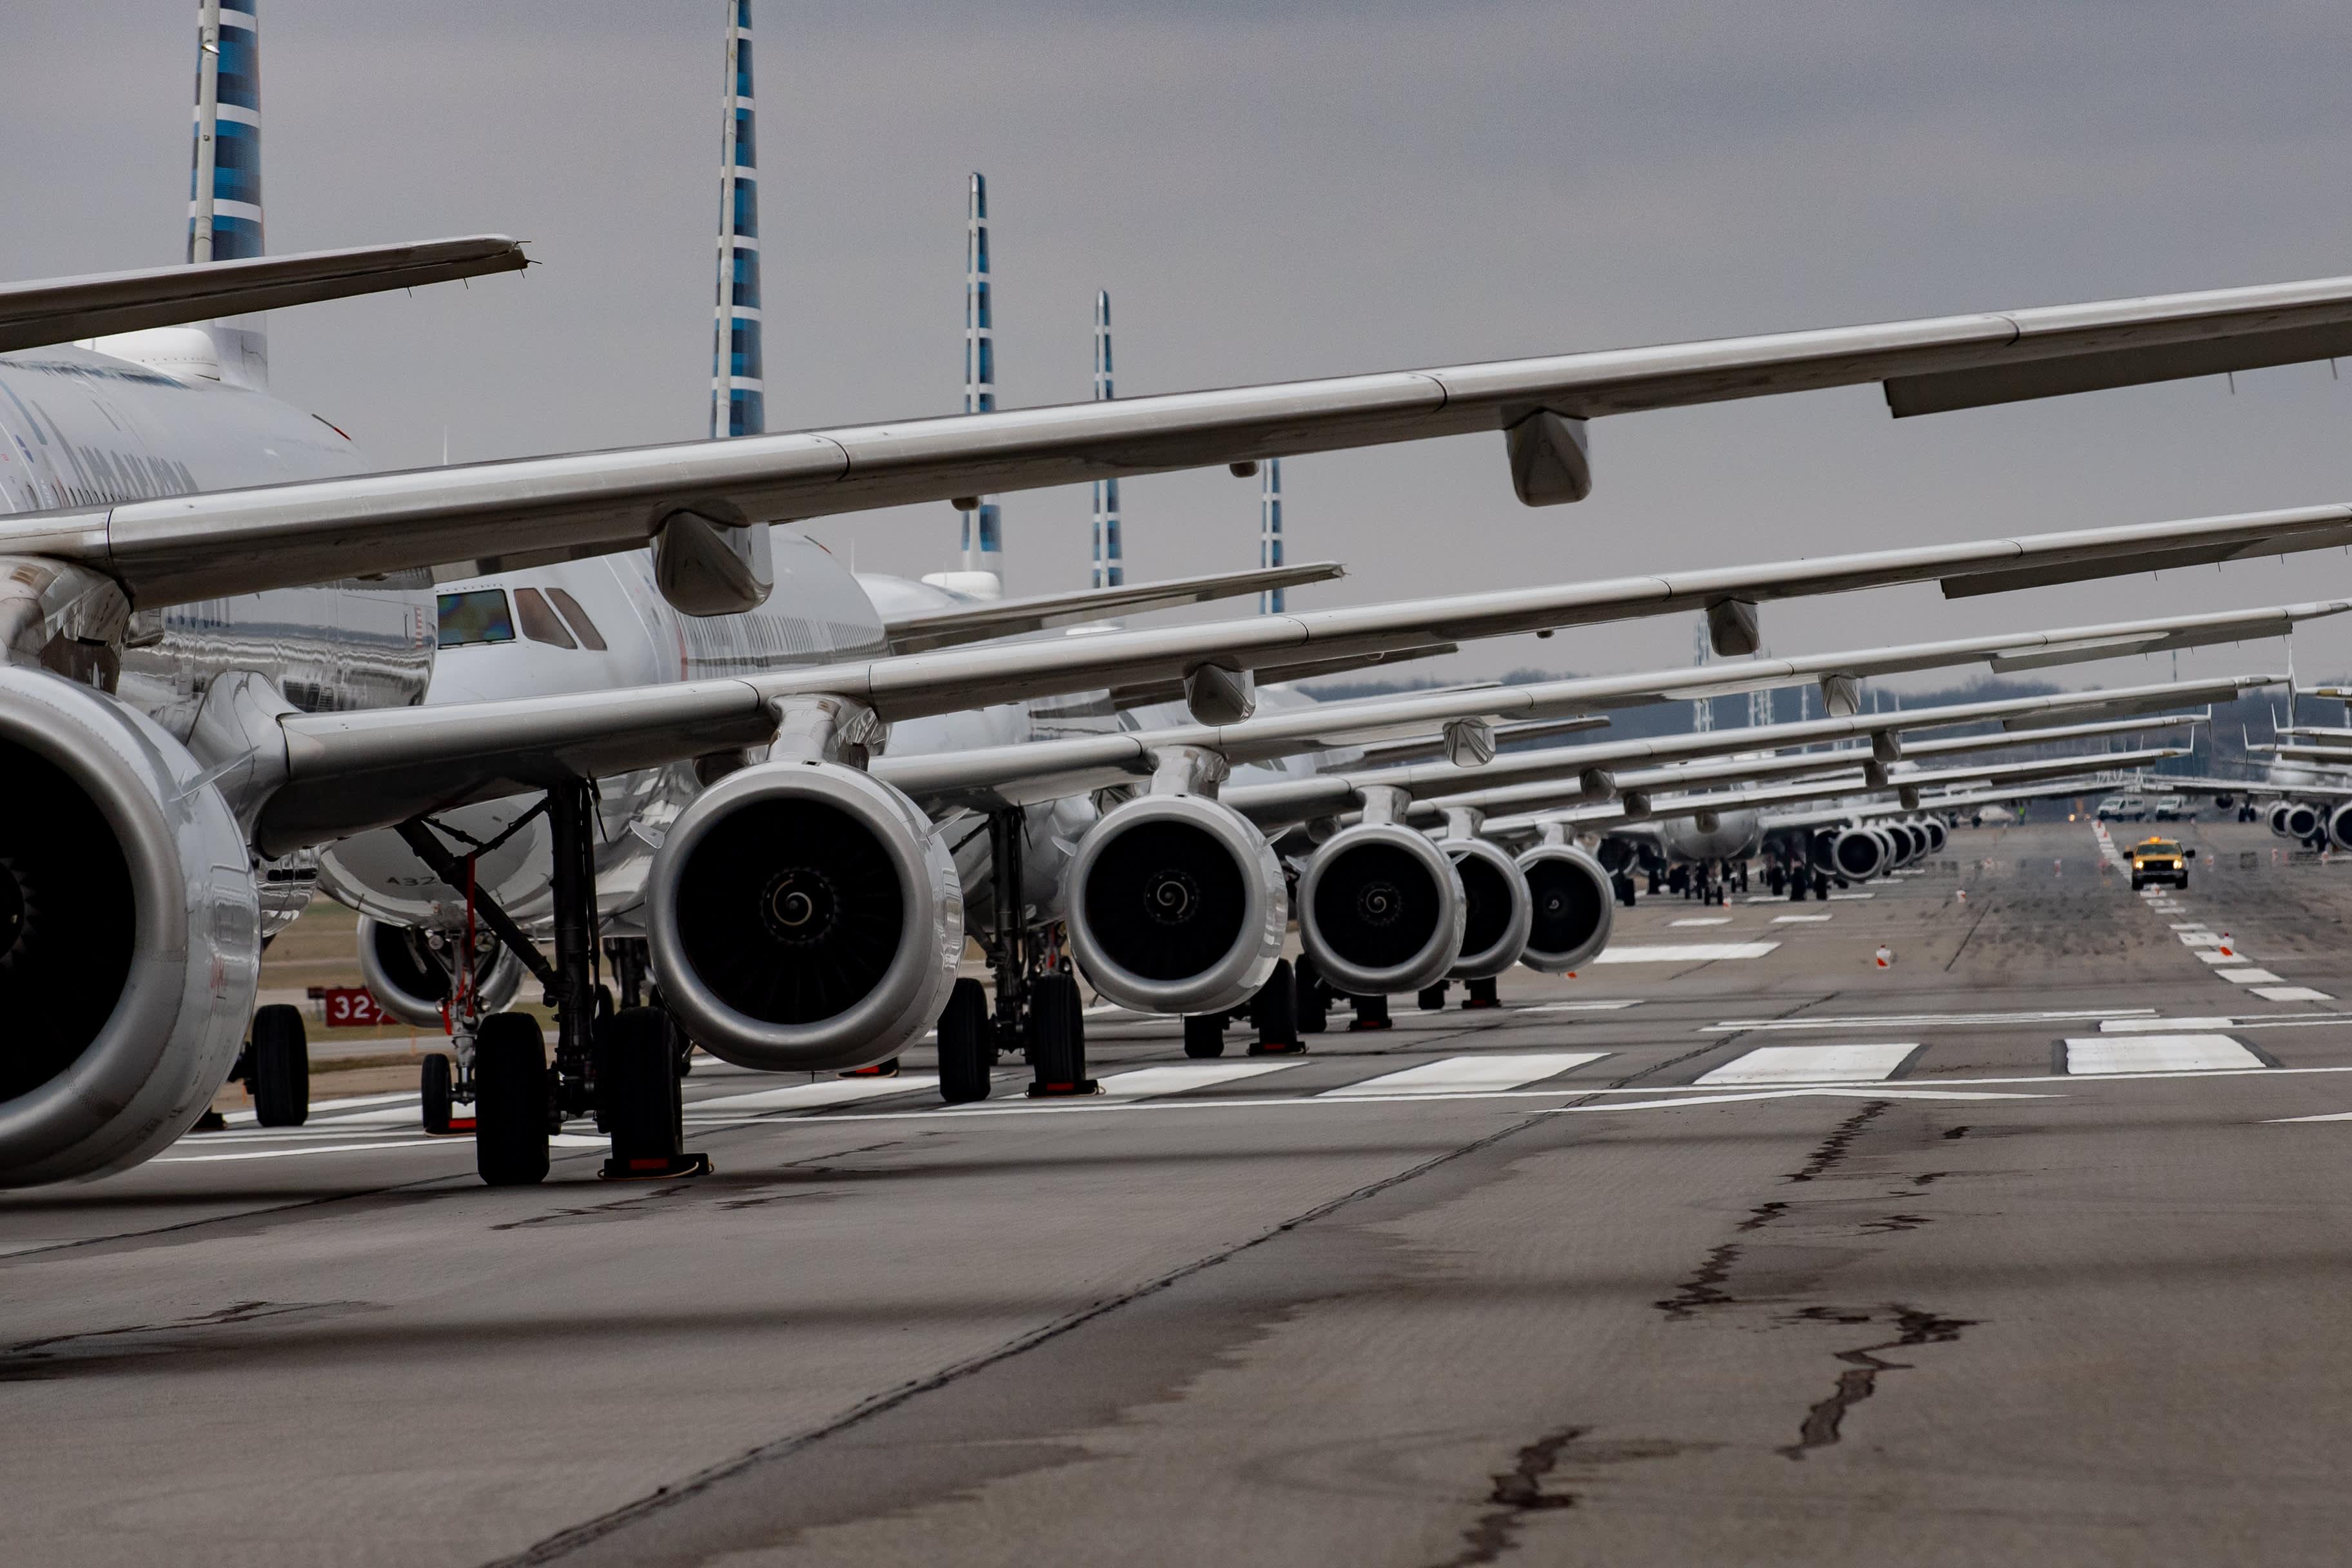 Coronavirus has upended another Warren Buffett bet on airlines